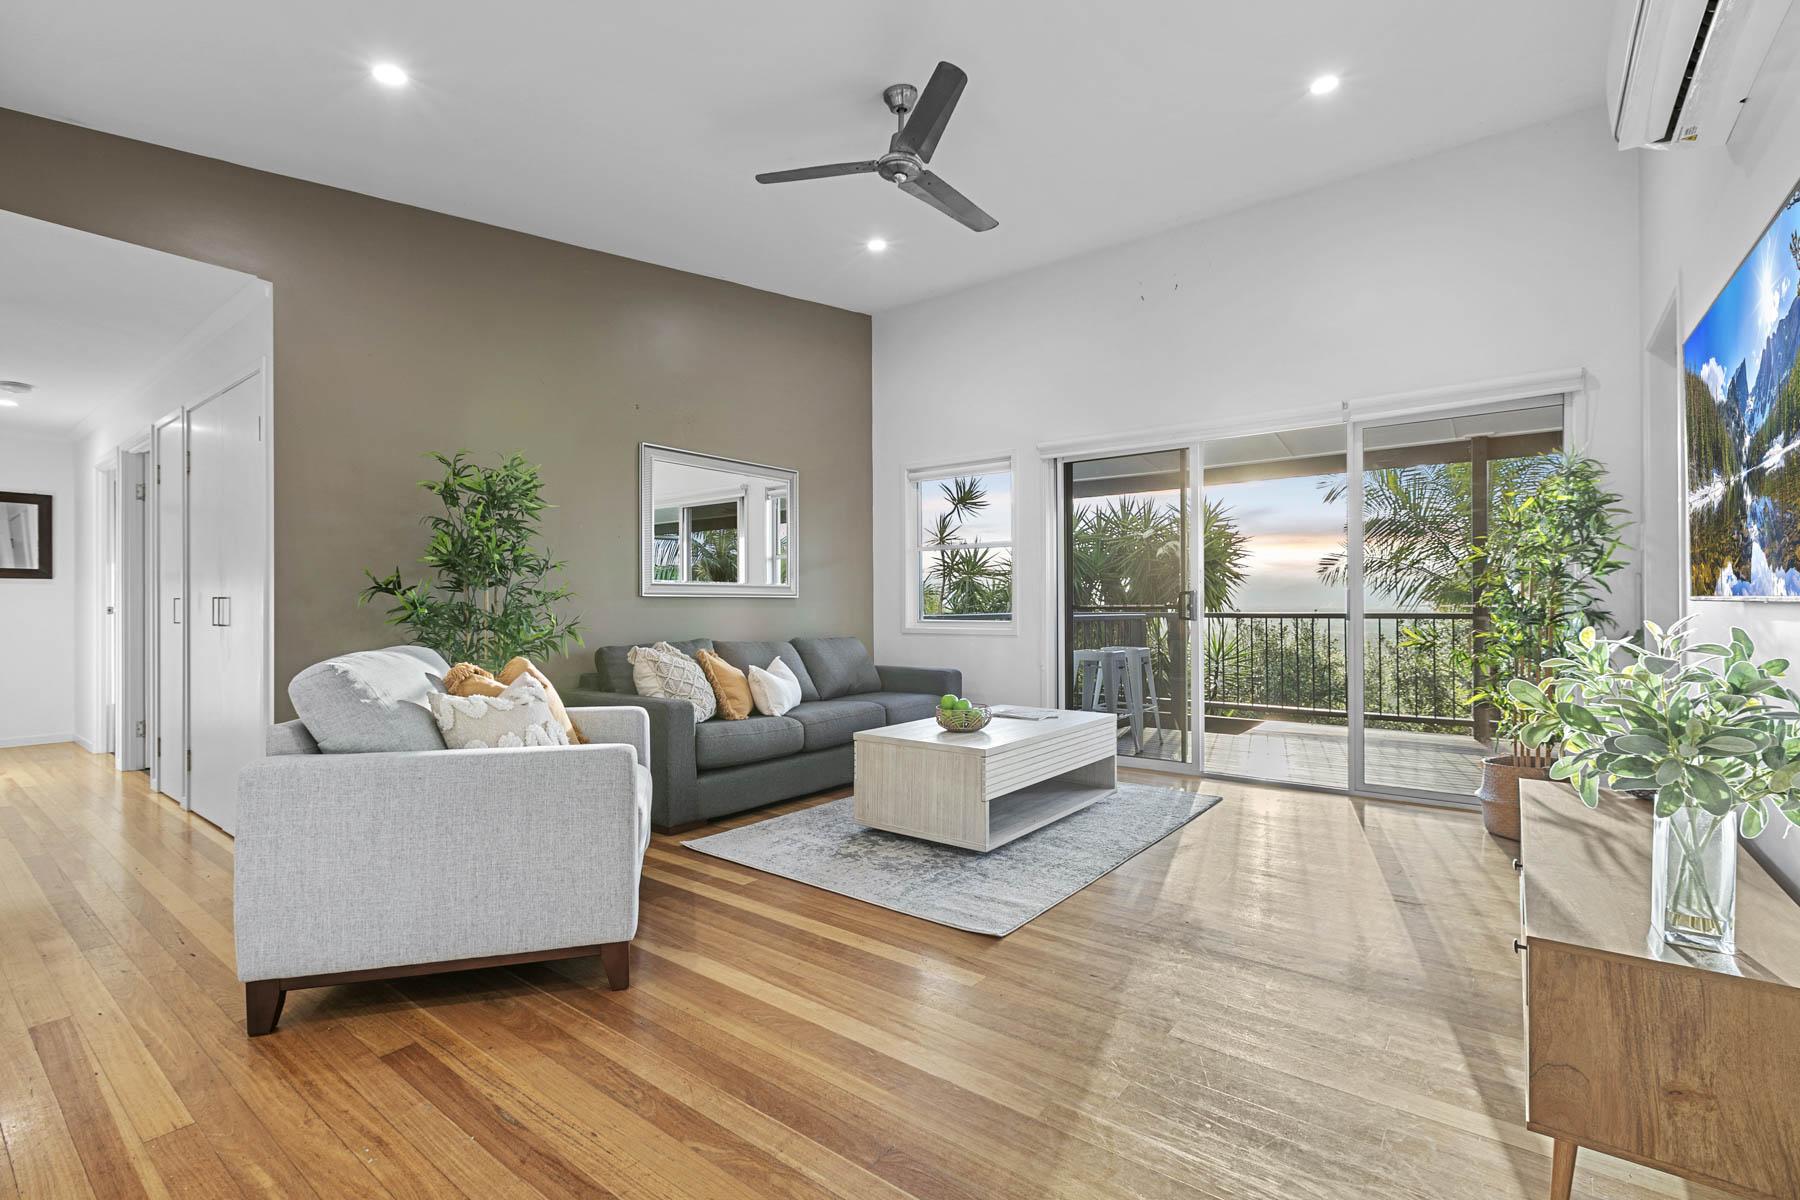 Million-dollar views await at this Coolum family home